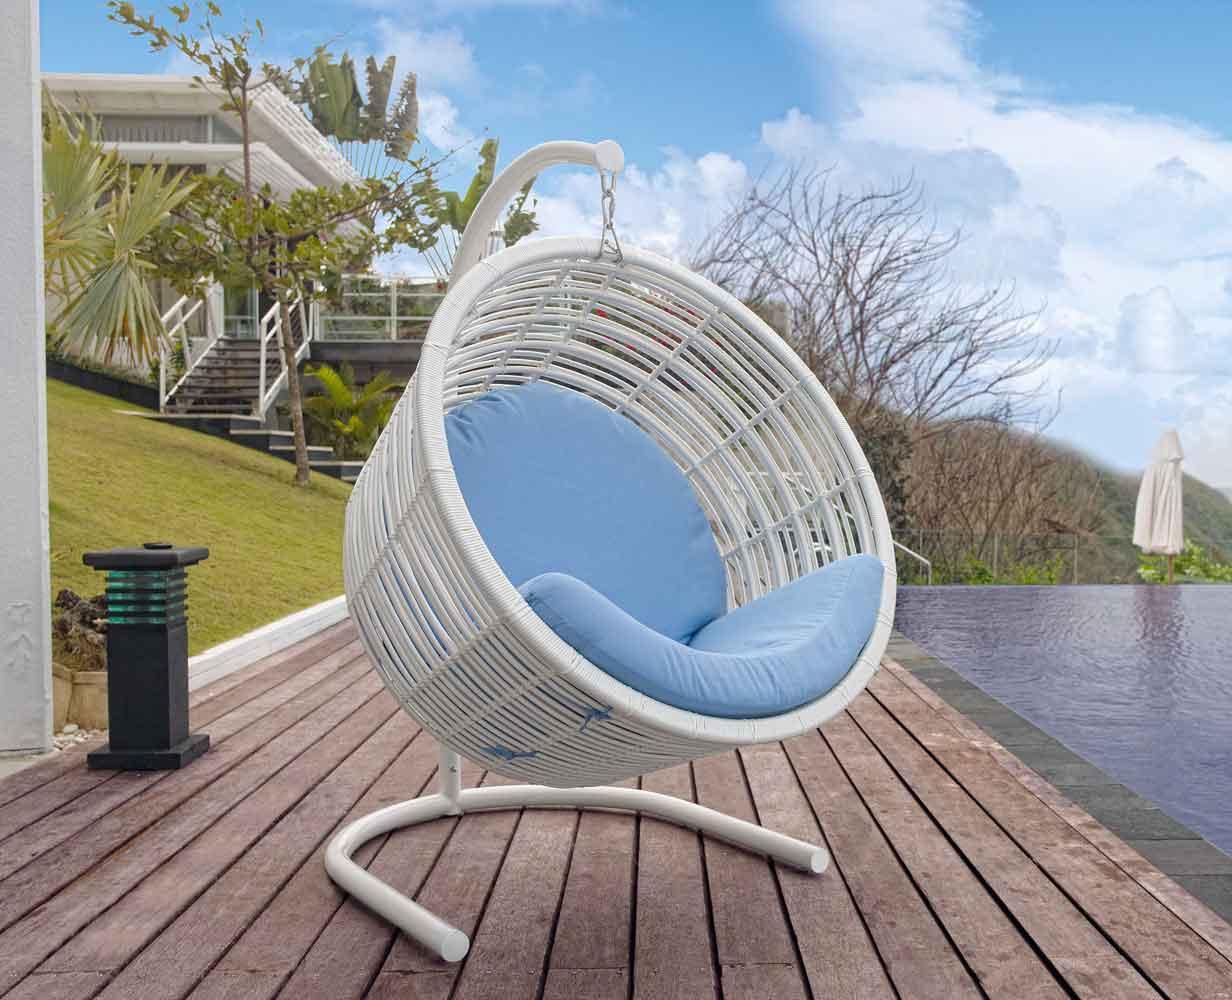 swing chair, hanging chair, rattan kremasmeni karekla, aioroumeni karekla, karekla kremasmeni se vasi, aluminium hanging chair, white stylish hangung chair comfy with big wide cushions